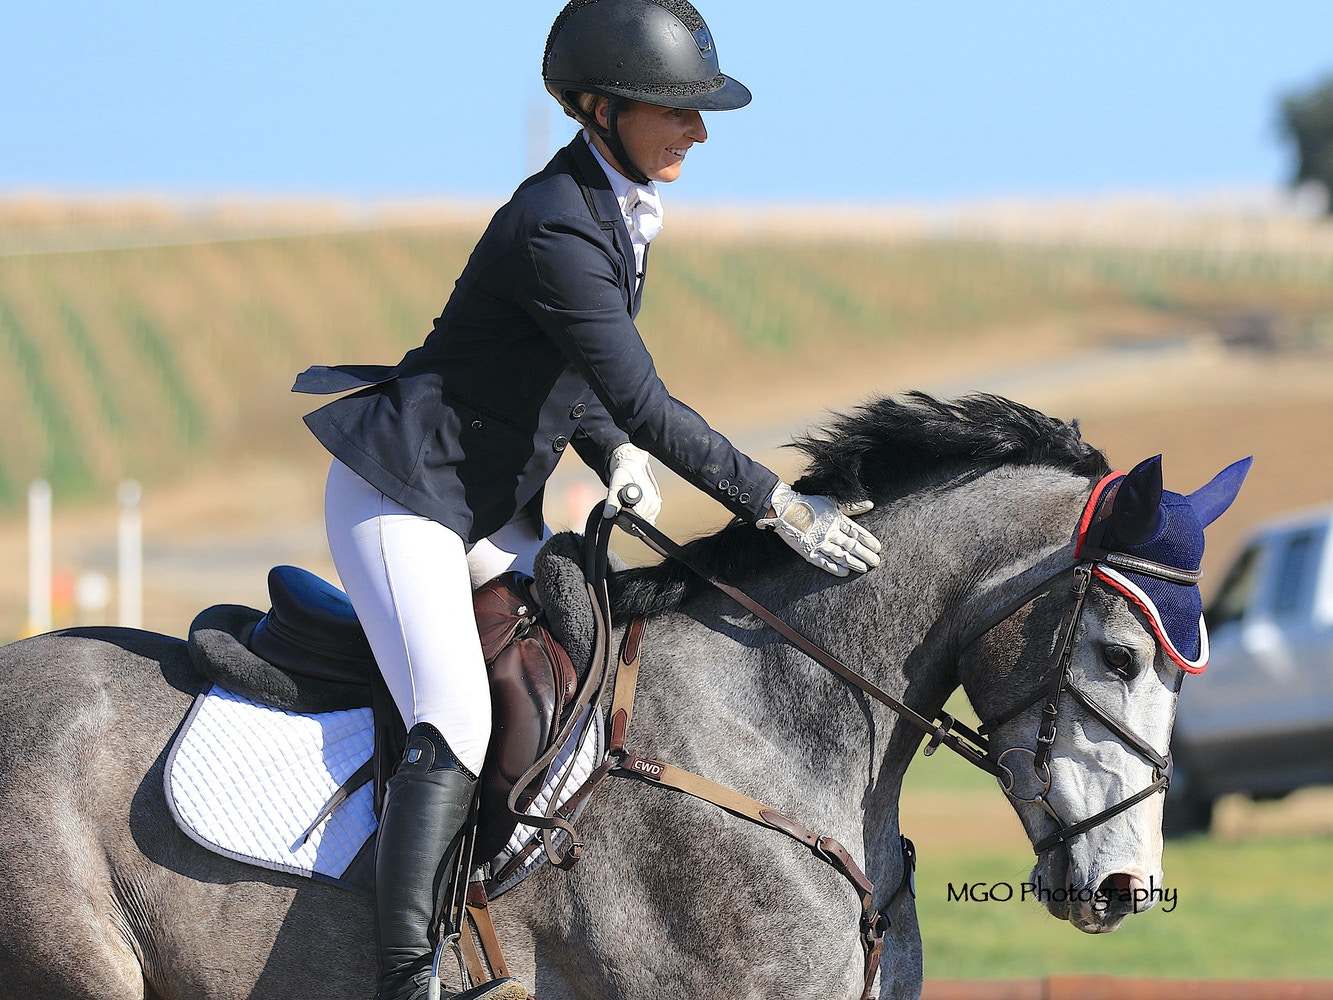 Featured Rider: Megan Sykes